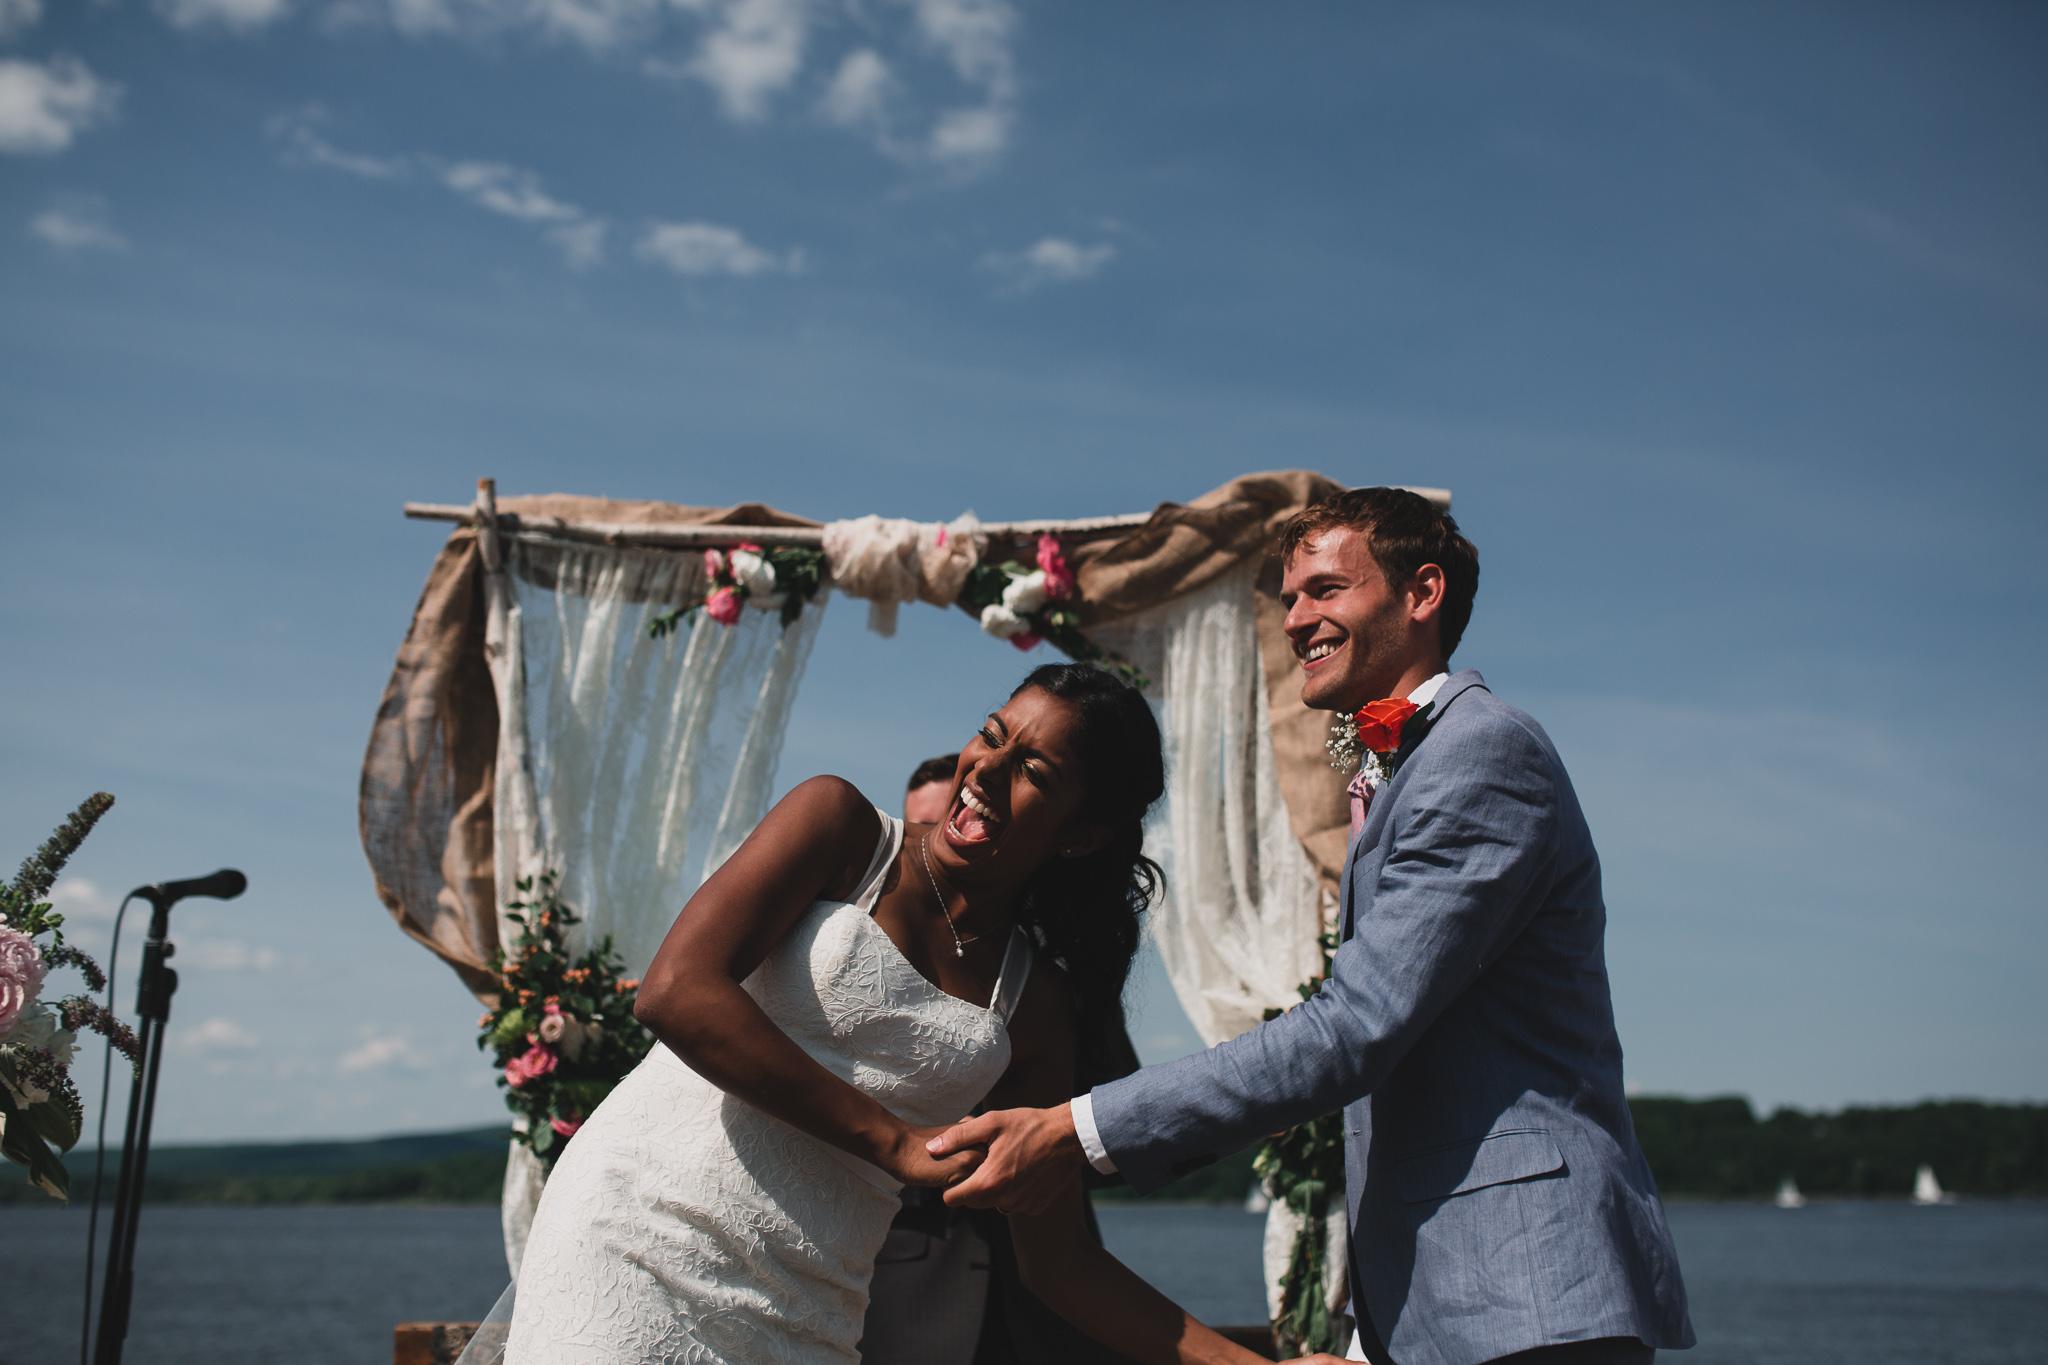 Outdoor wedding monreal